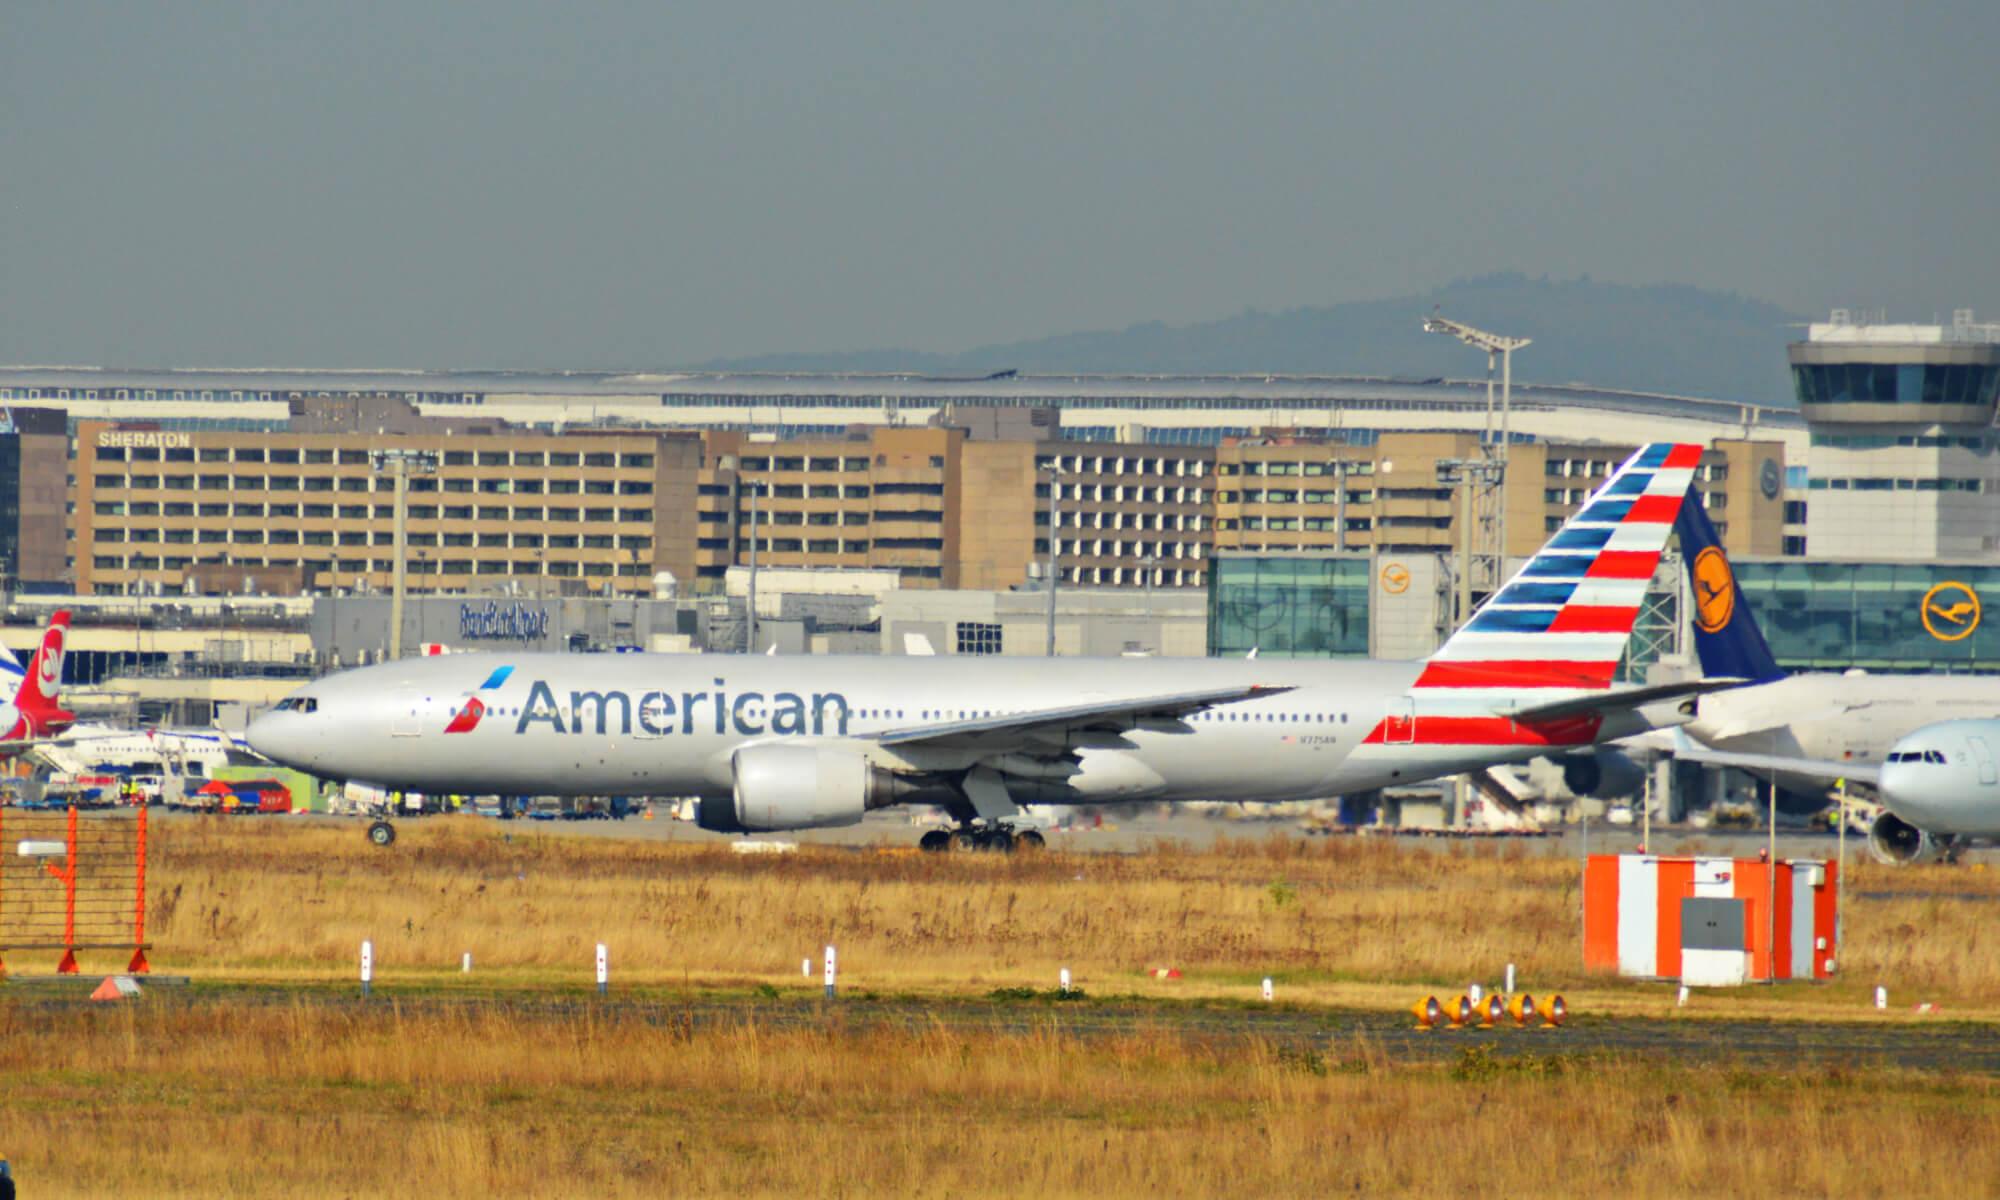 american airlines plane in dallas, texas